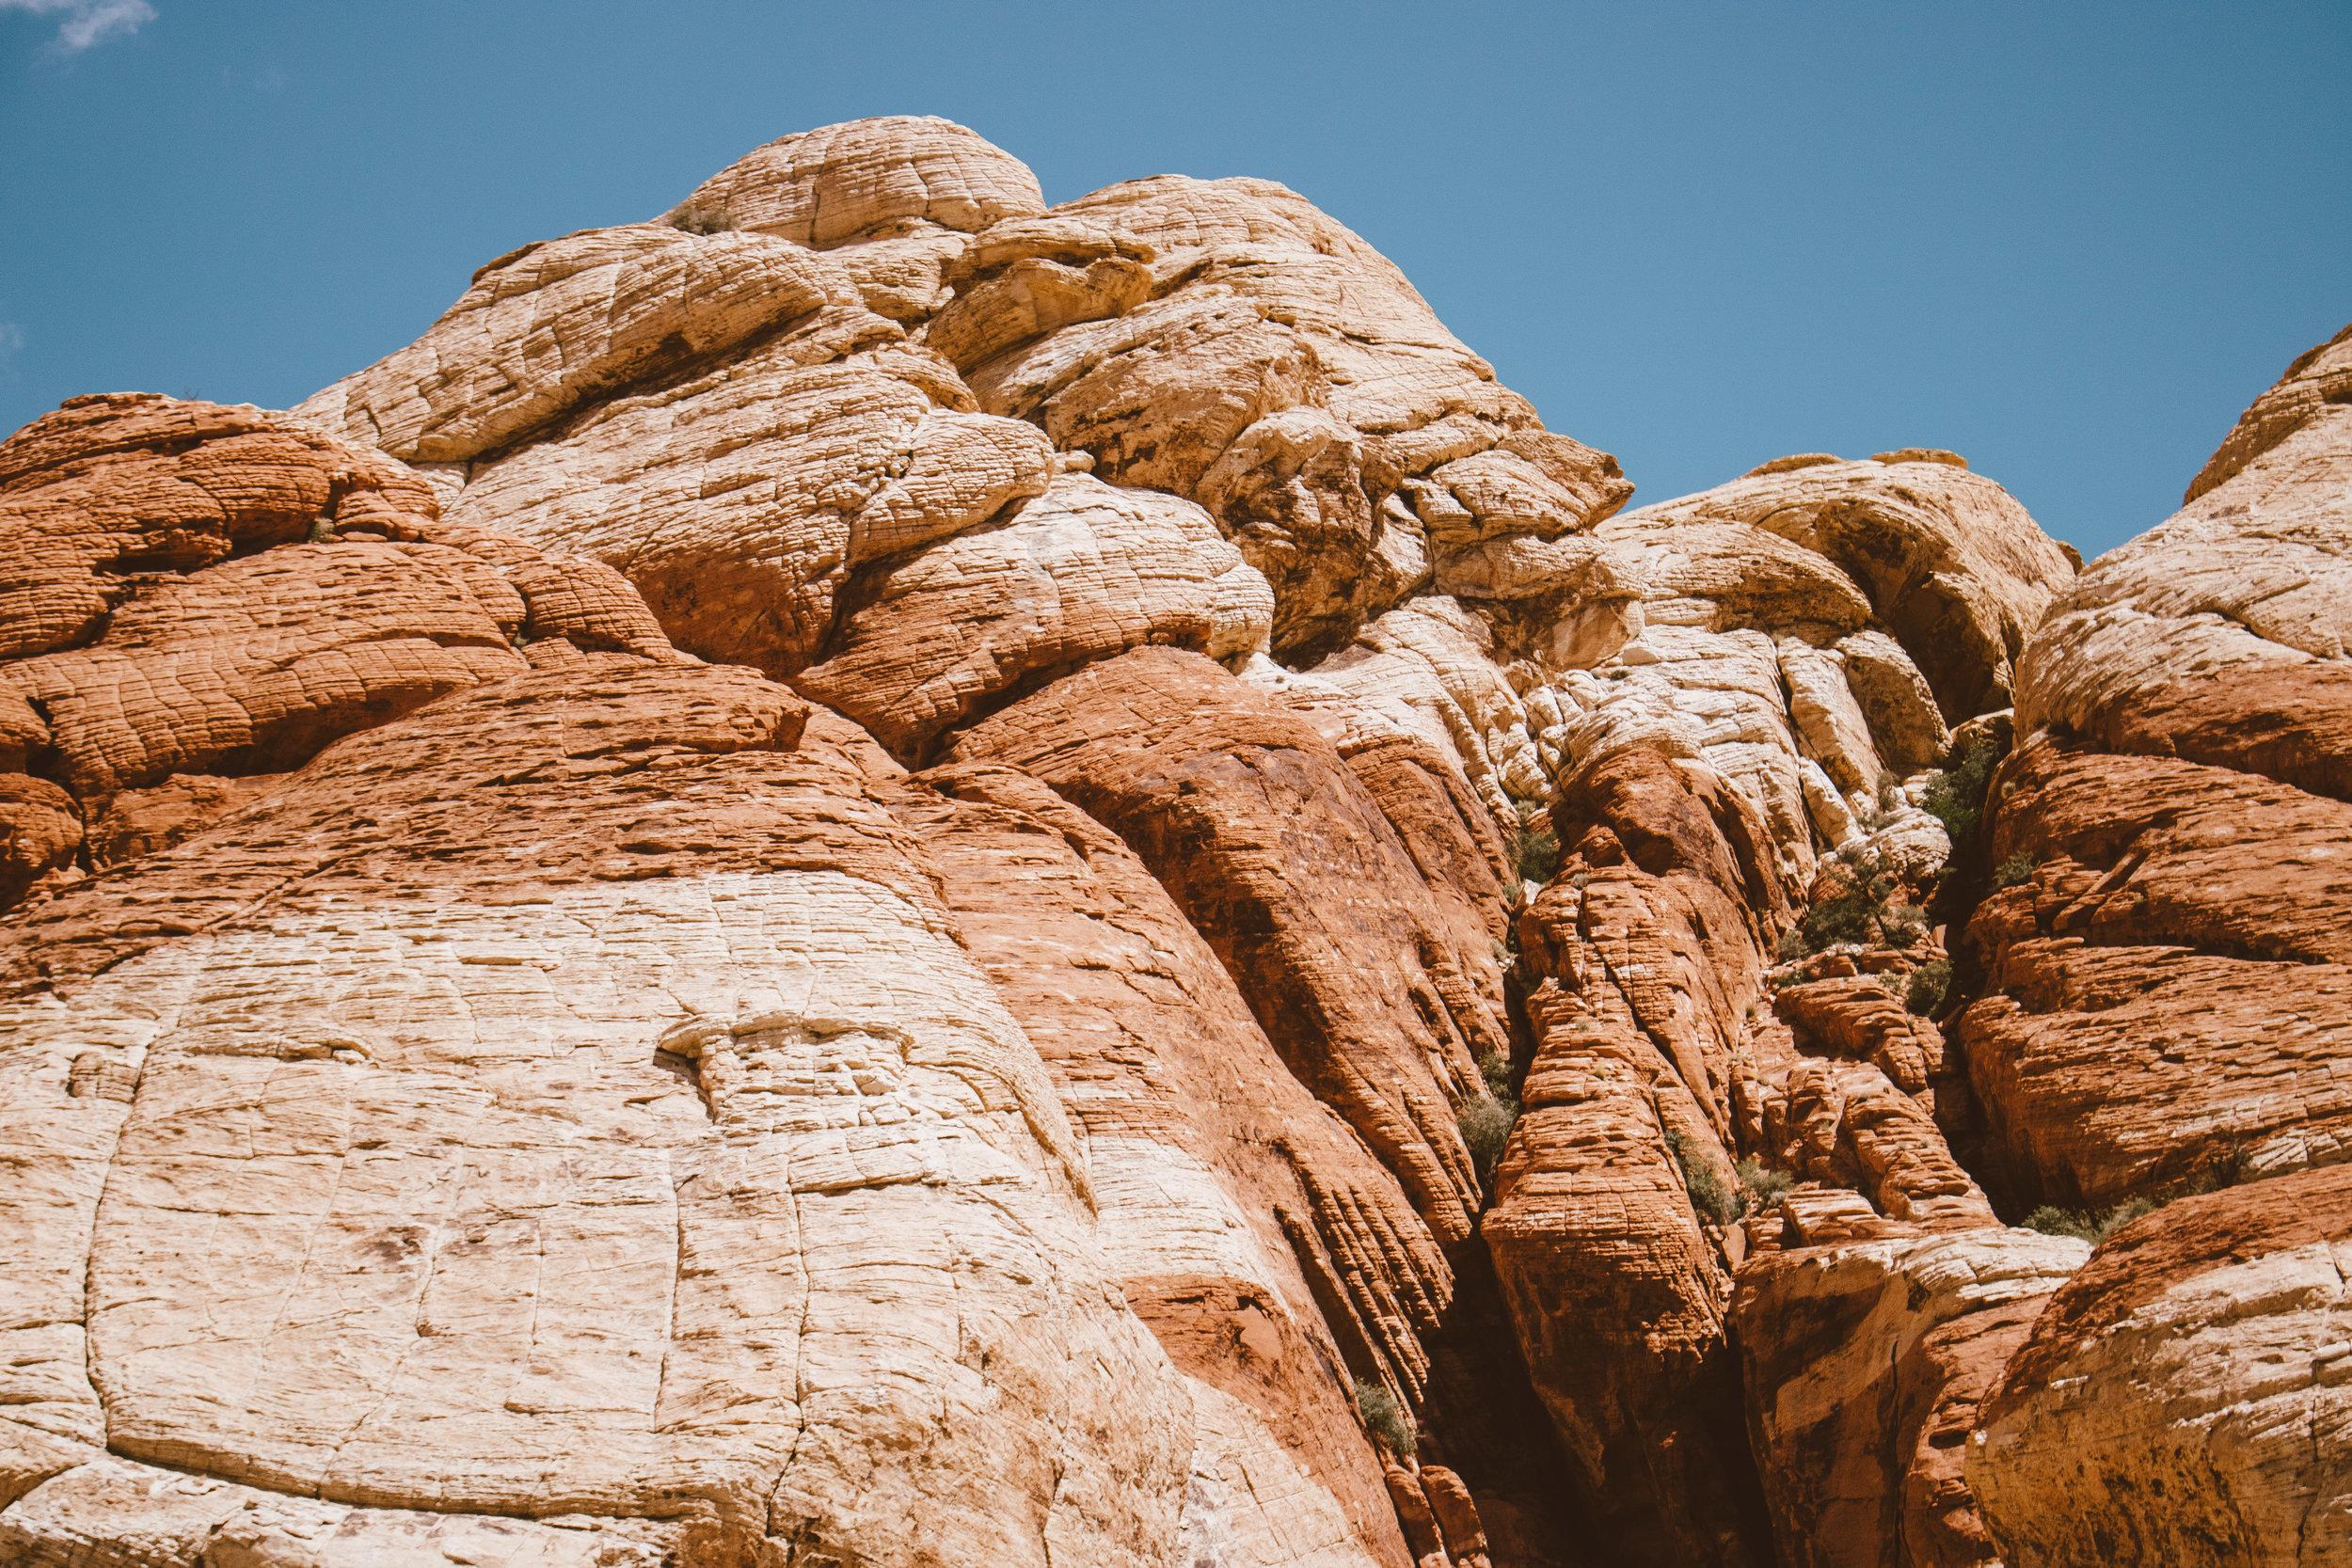 The stunning sandstone quarry's